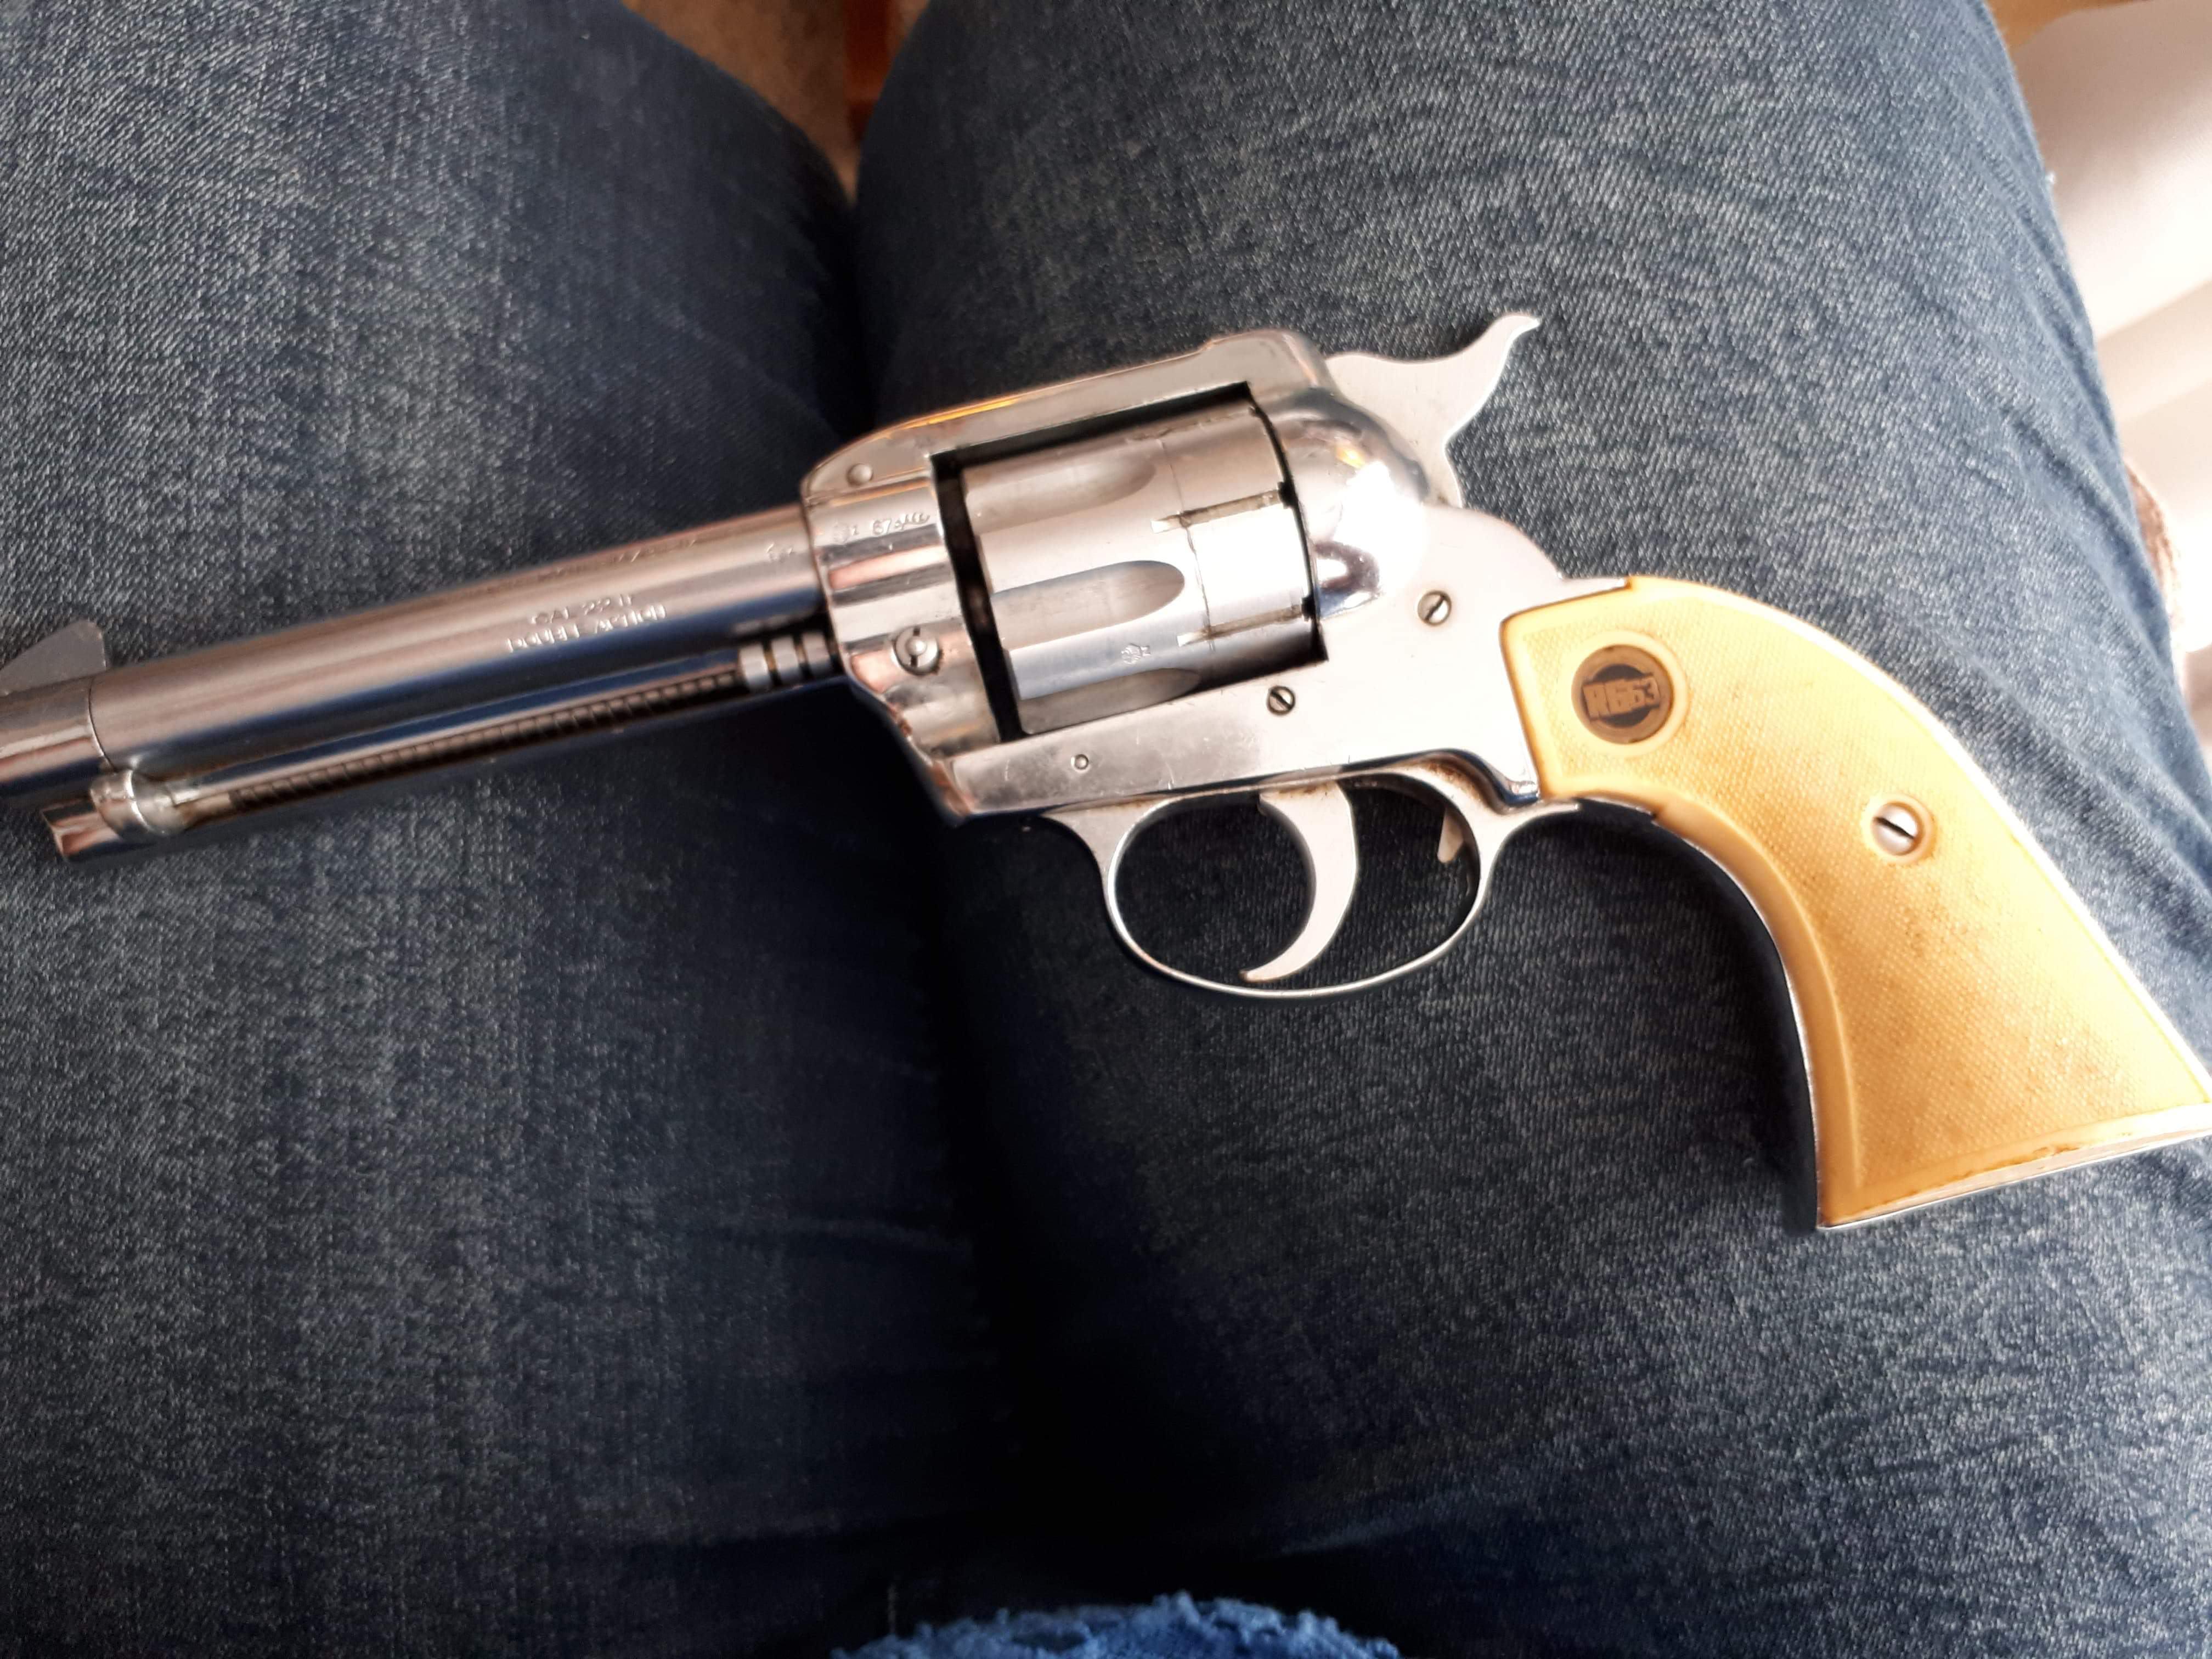 Valeur d'un revolver ROHM RG63 calibre 22LR Y4m_b1PdGI6Dy7cynkqQMS6k6_wSsGrX8Muh8P1yj6LkRU8gnDkvhGDmhNzGa7vhyZYx8XP5nUK5DrgGqEdKpYQpzd7sb0MFJGeRHEYMGpZu4CJ9QiIss4YD938Nz1p48IywwfrguE2QKMo-2ZgKWWiD1hUl0ZsO7LY9wqzLw3WMNvf88FaJPWTxc_x-fHlMpD6?width=4032&height=3024&cropmode=none